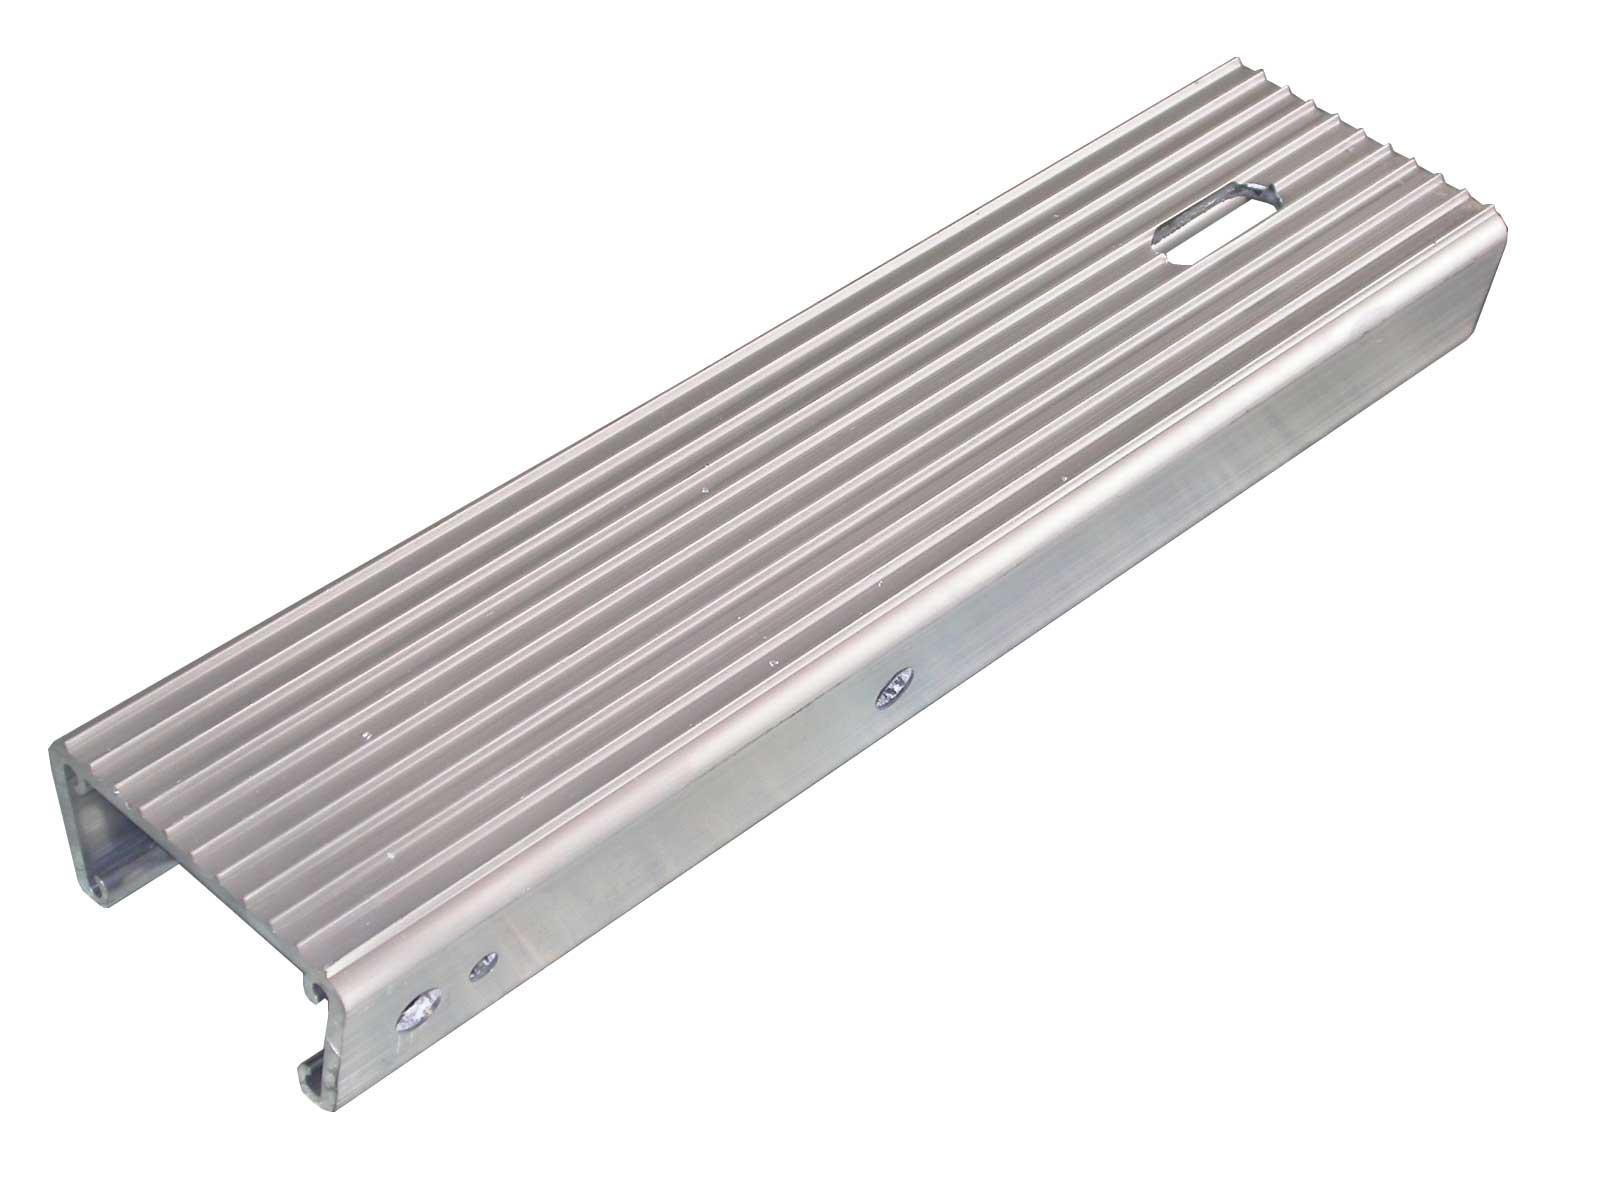 Aluminum Trailer Fenders : Fender step aluminum w u bolt holes load rite trailers